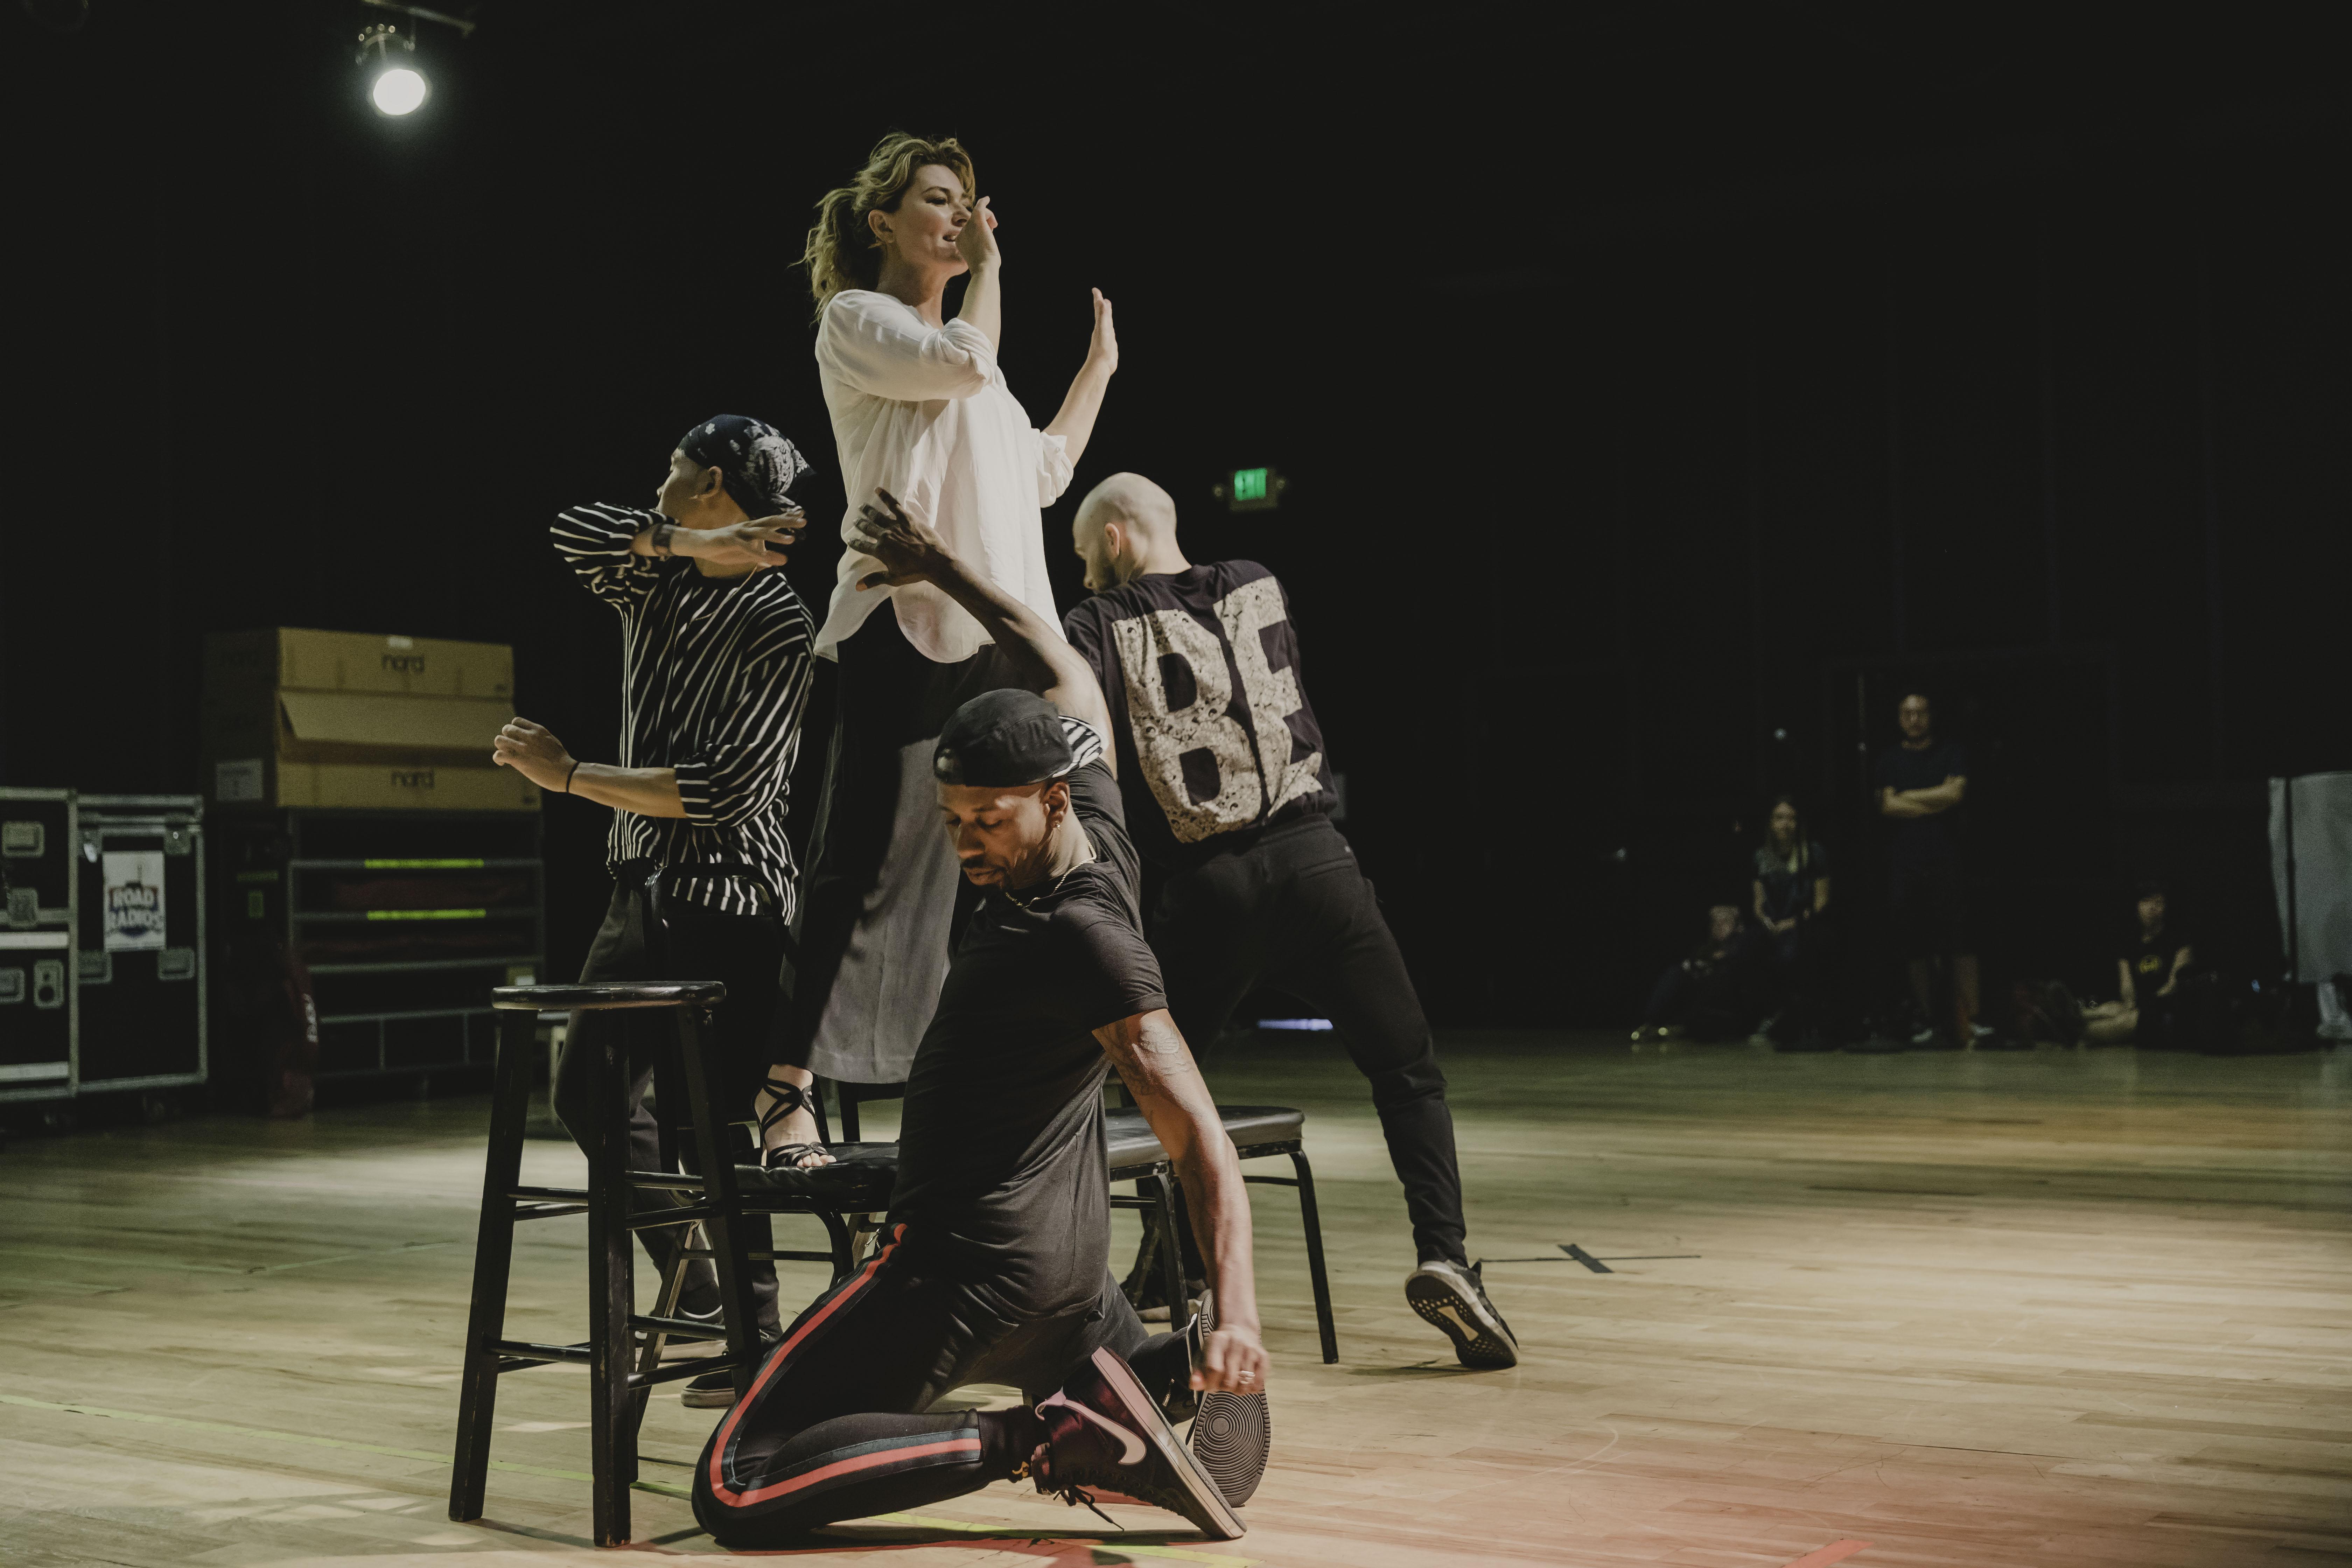 Watch] Shania Twain Shares NOW Tour Rehearsal    | News